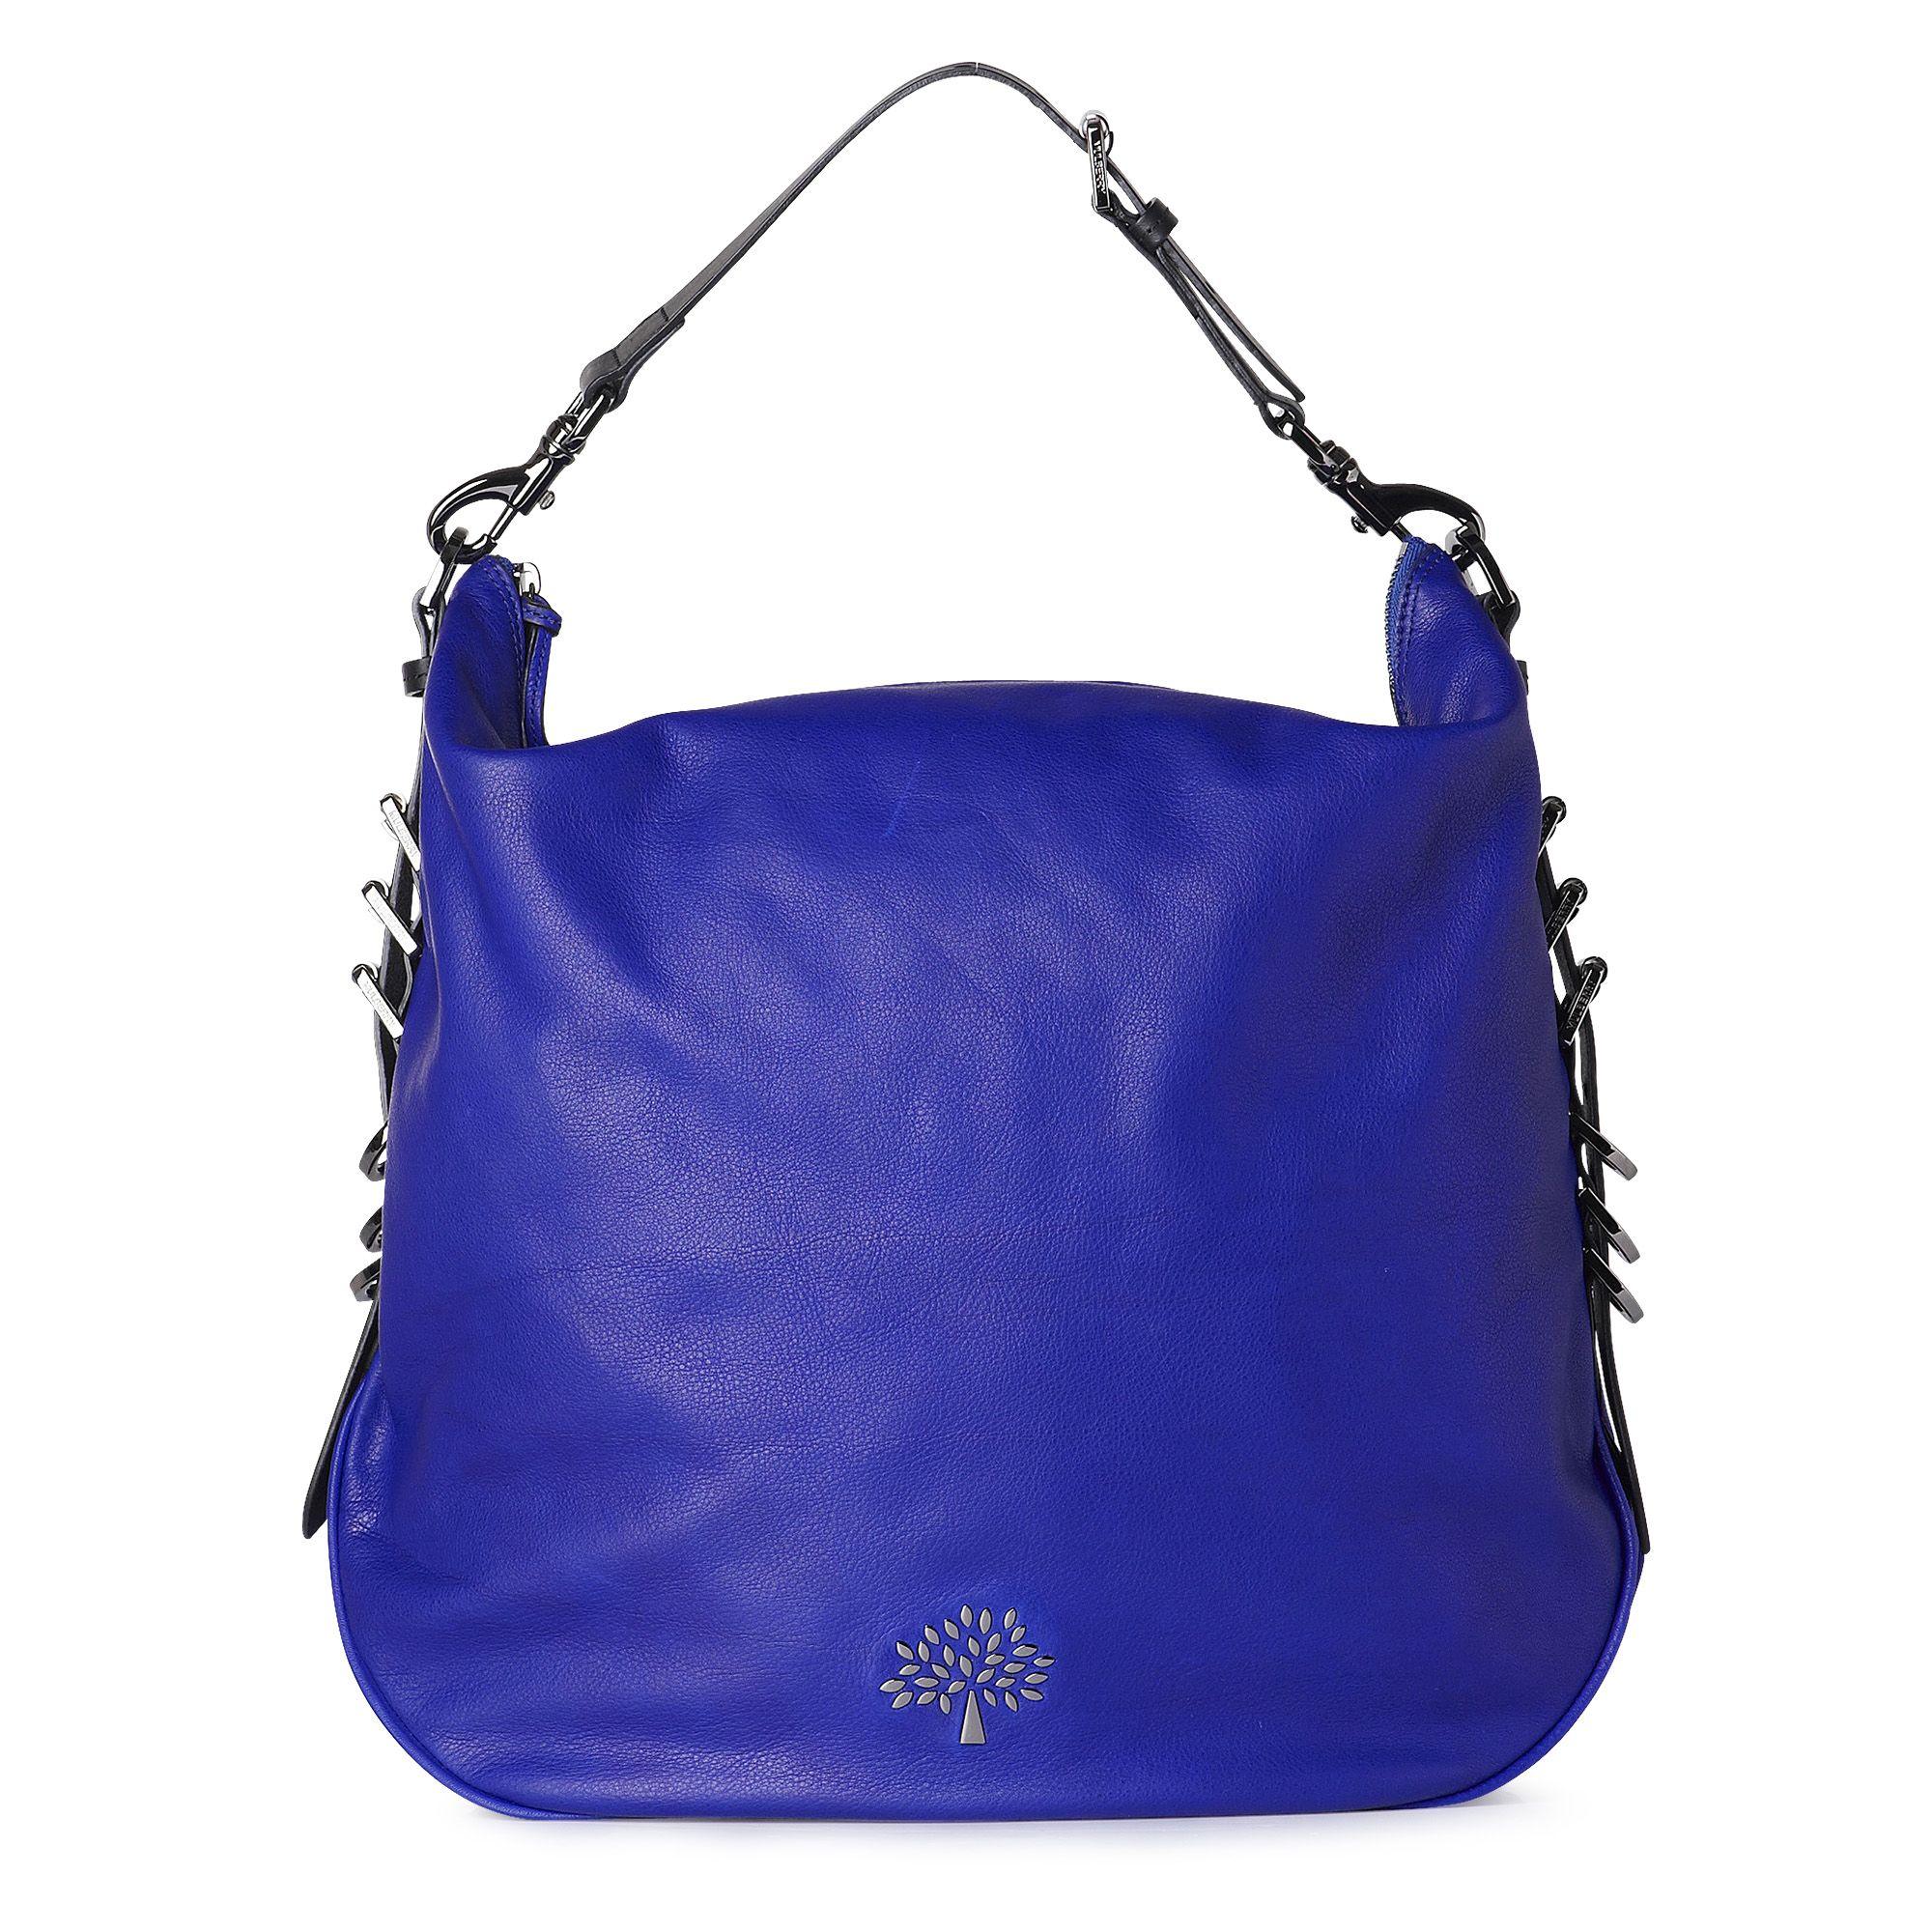 Mulberry Mila Hobo Bag in Blue